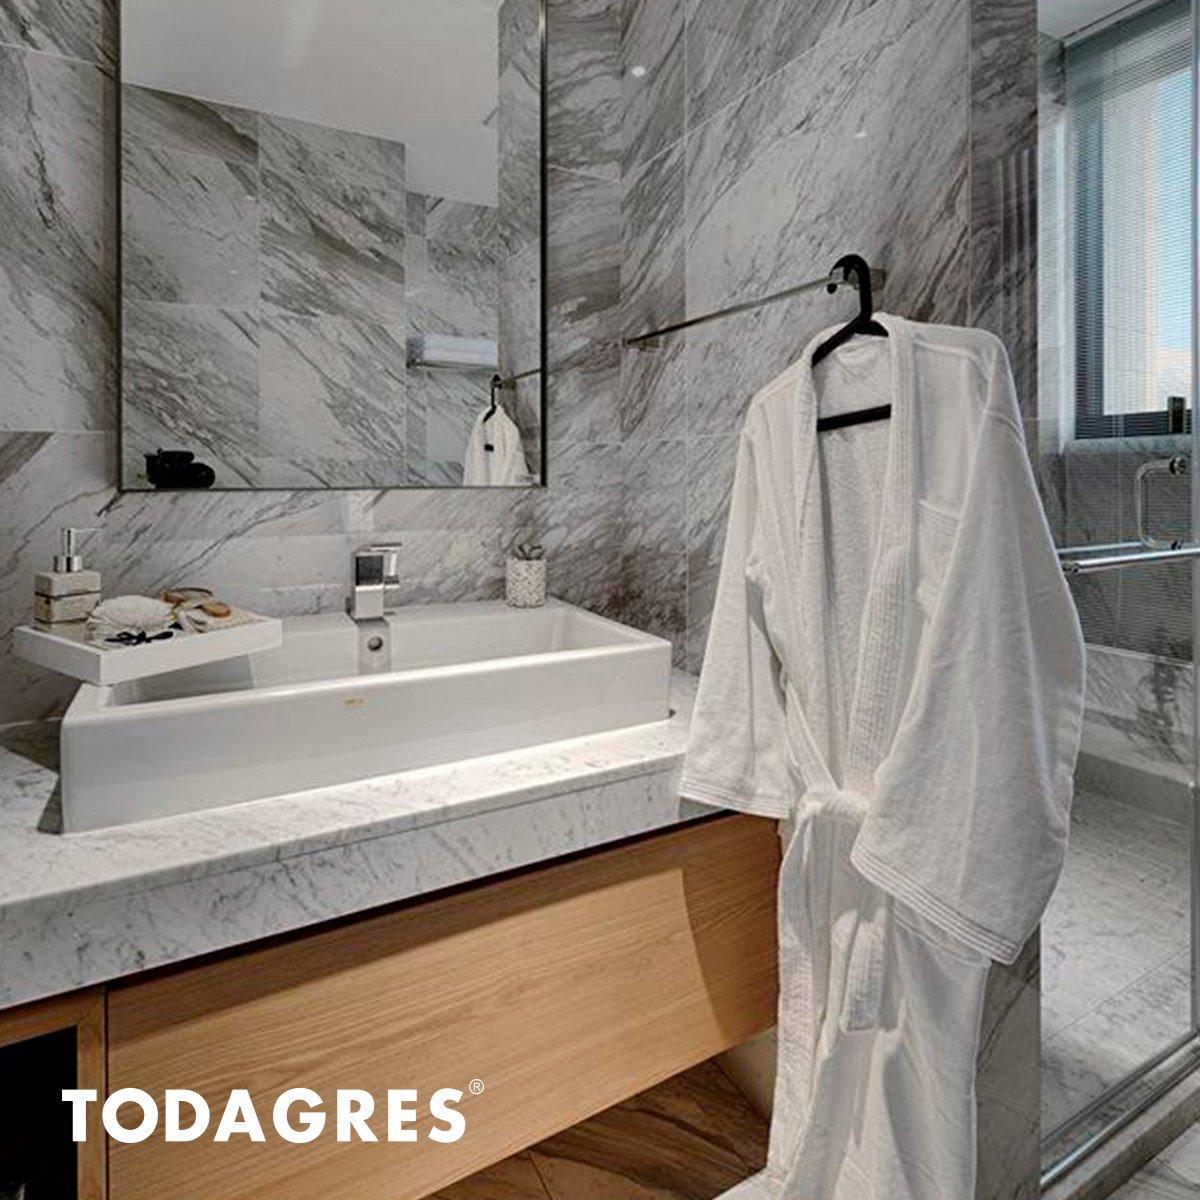 Luxusné kúpelne zo Španielska - luxusný oblad Macael 120x60, 7,5 mm porcelanico